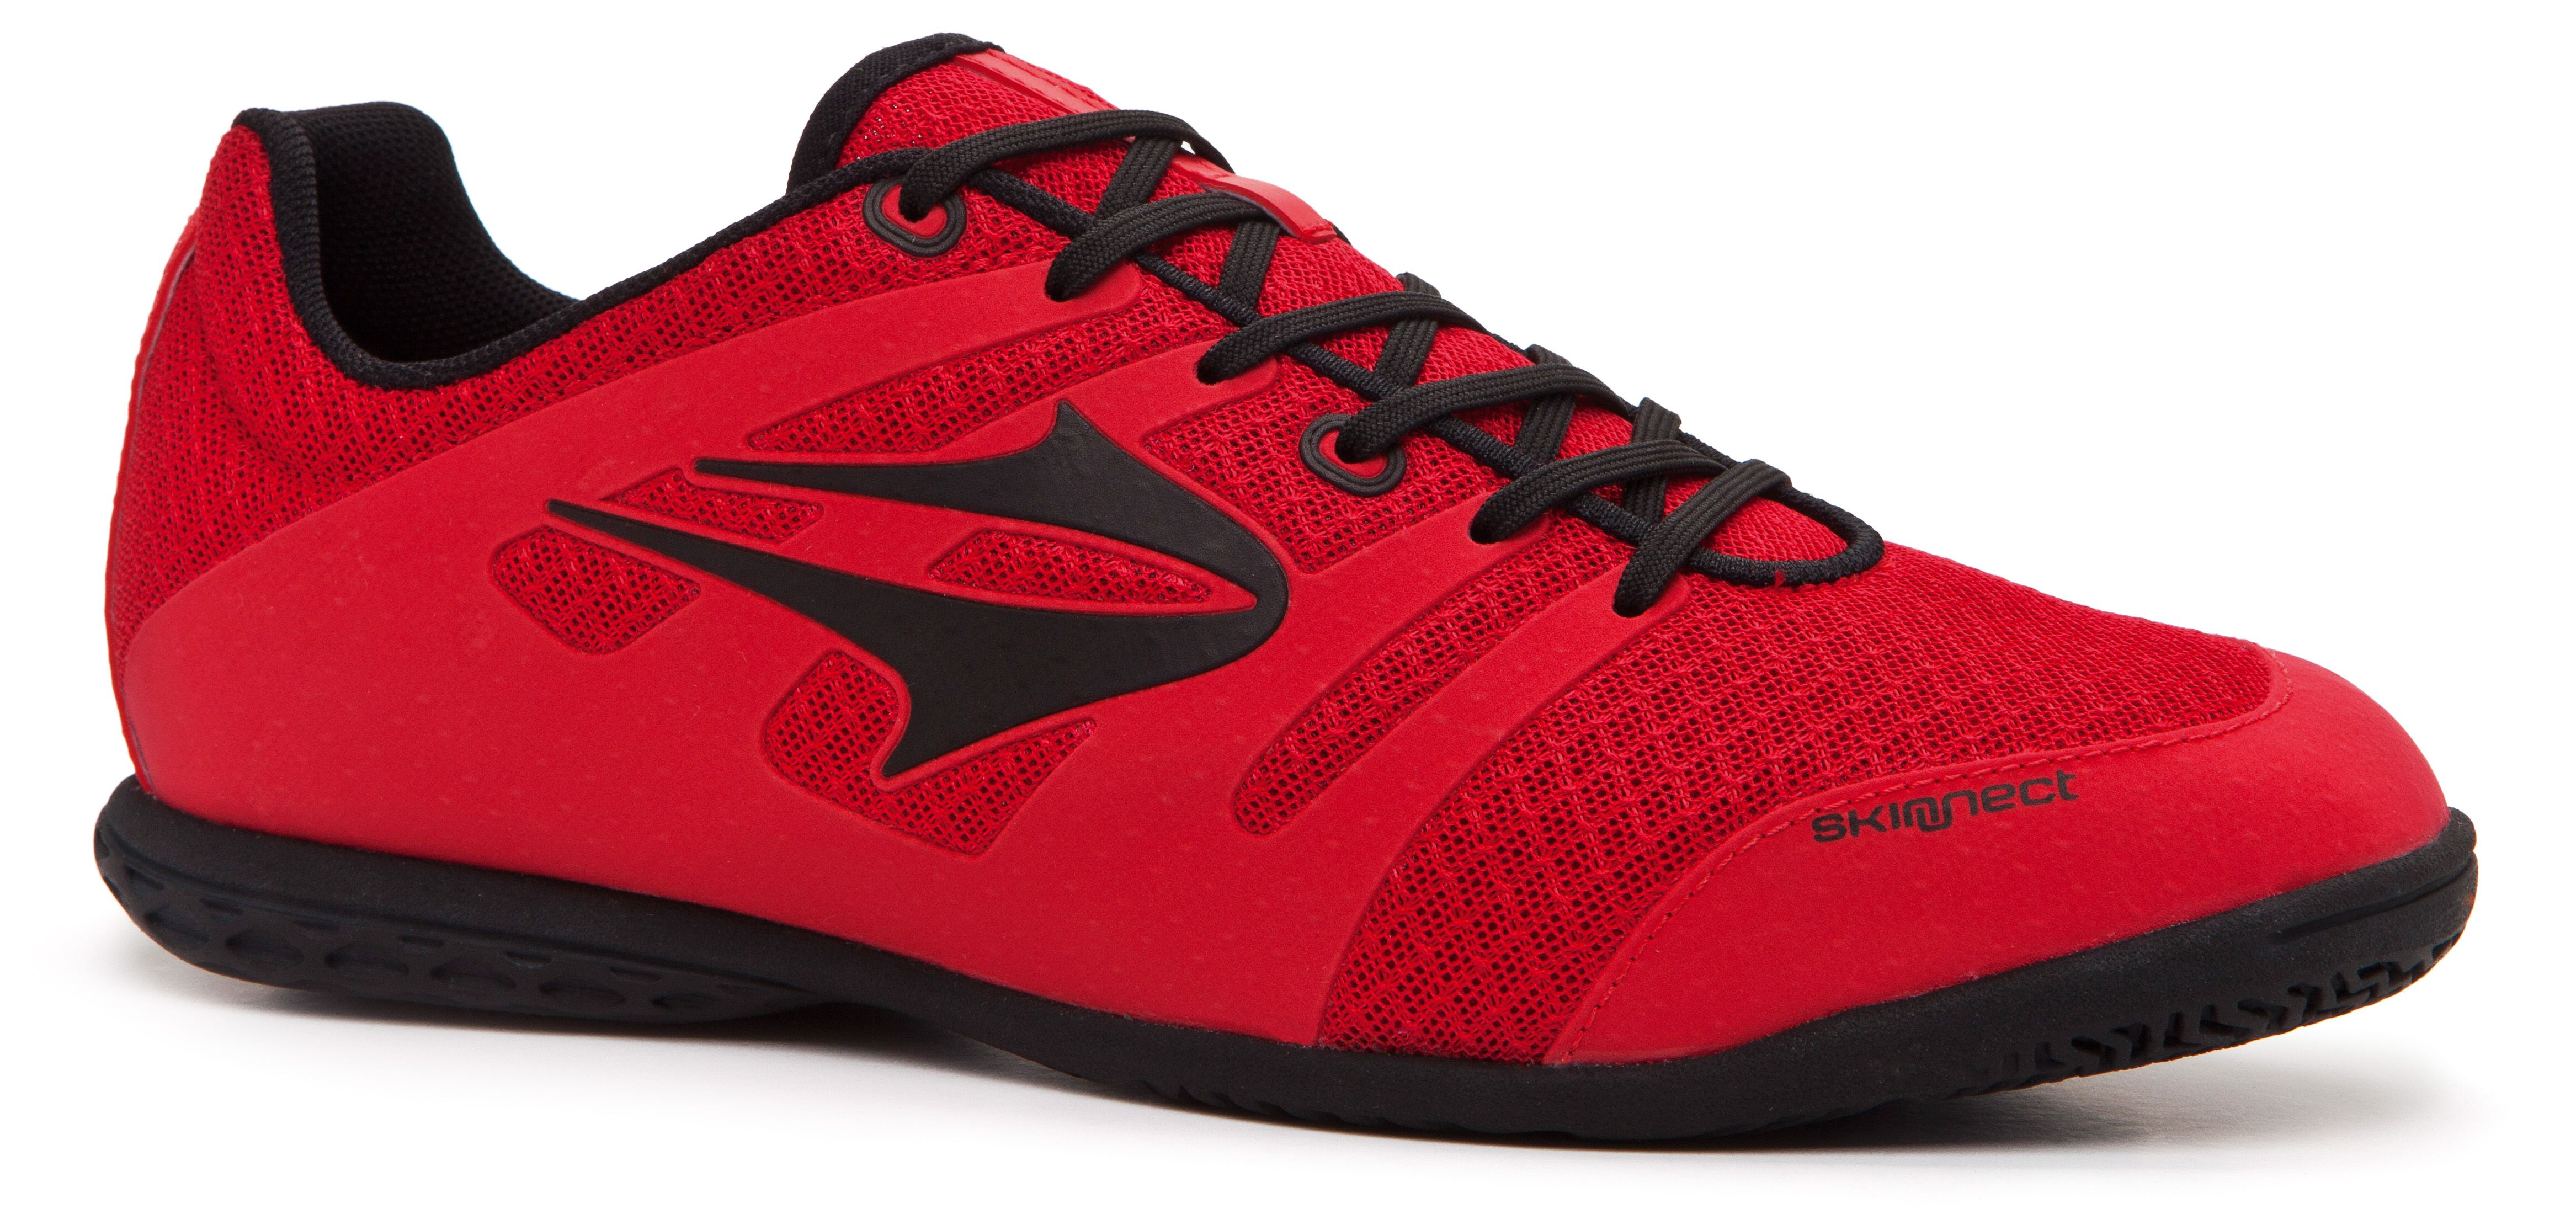 2015 Chuteira Topper Letra futsal vermelha preta  d94ab9a5ee3f5